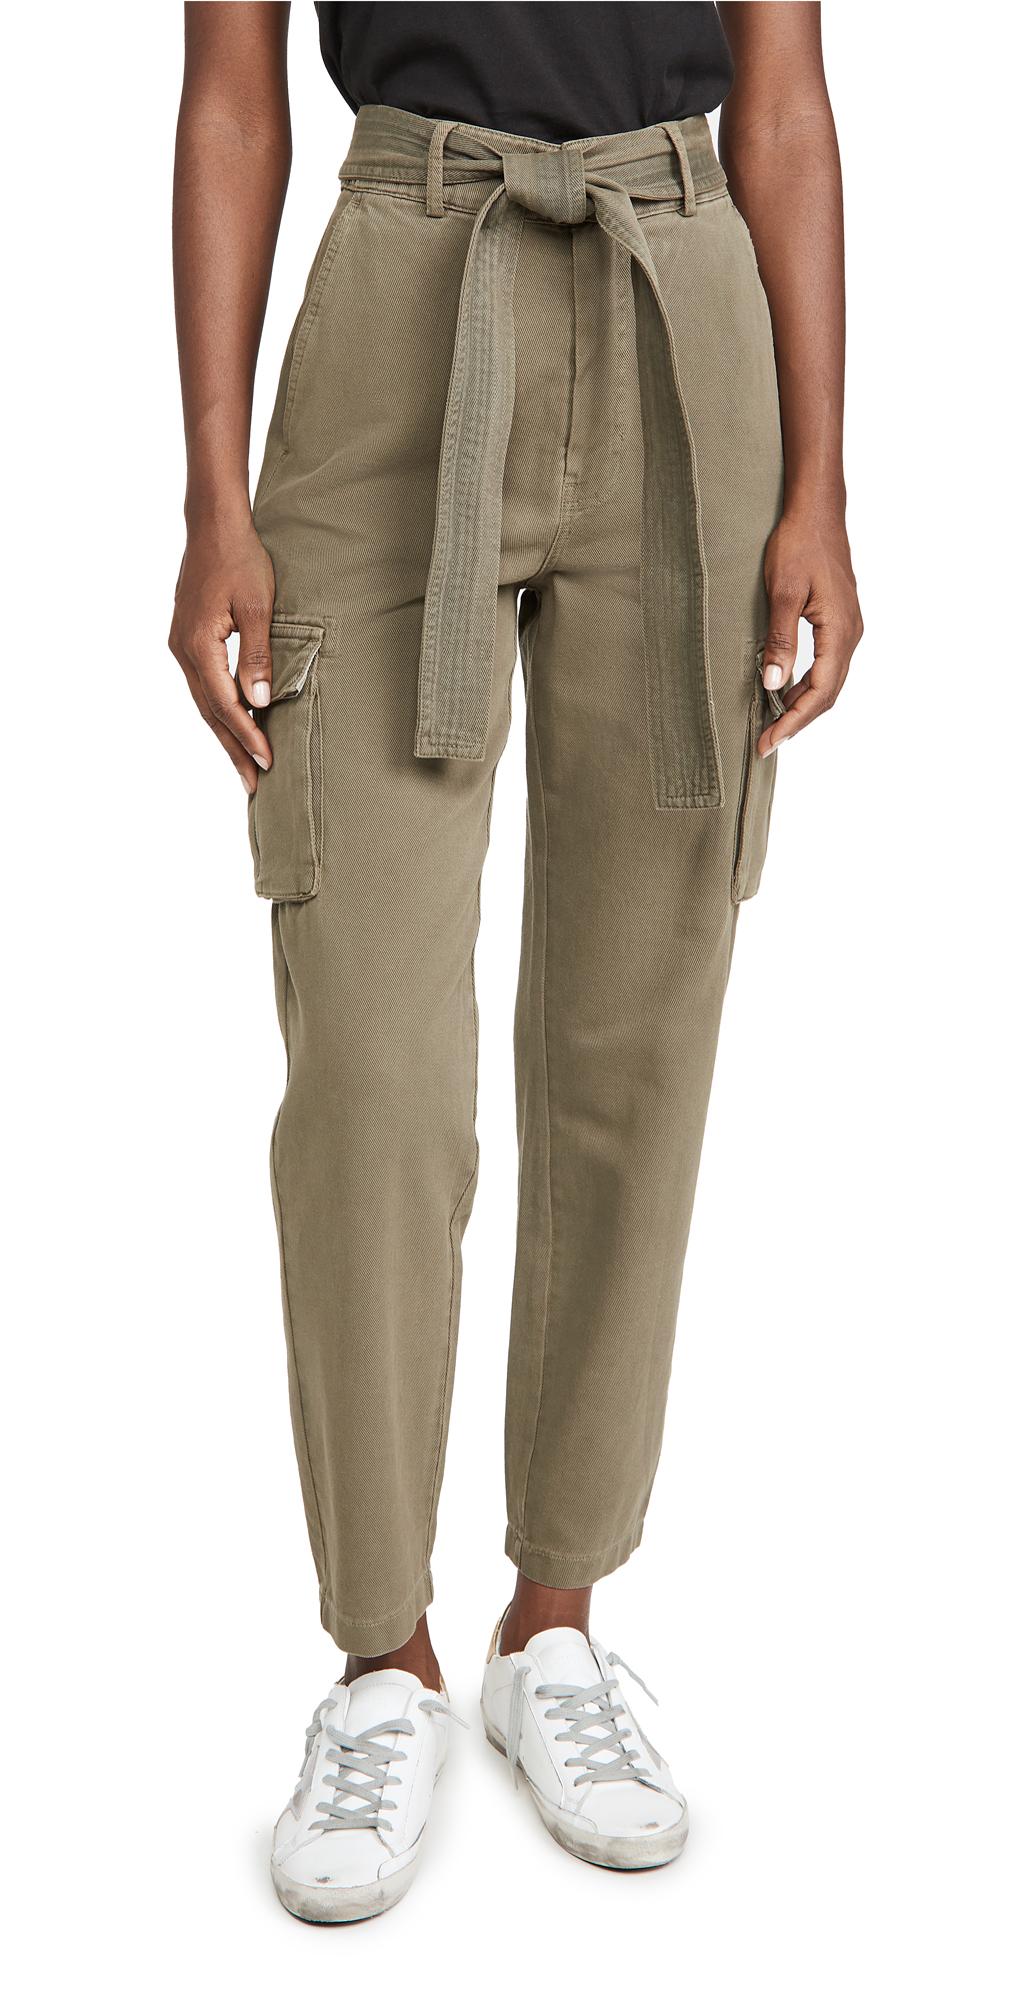 ANINE BING Kennedy Cargo Pants